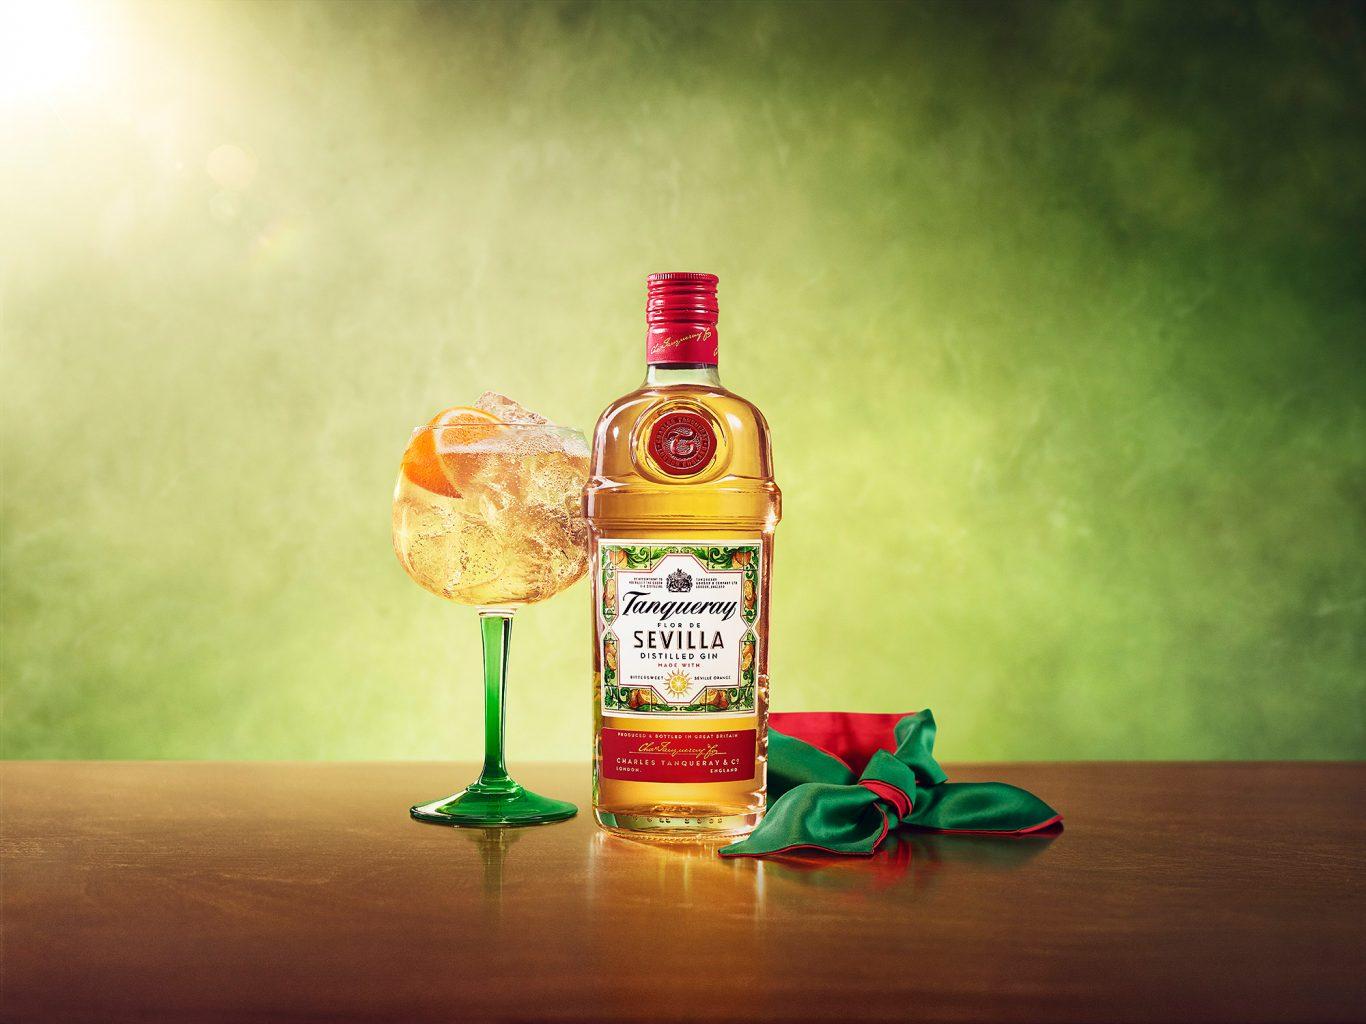 Tanqueray Sevilla | Tanqueray Gin